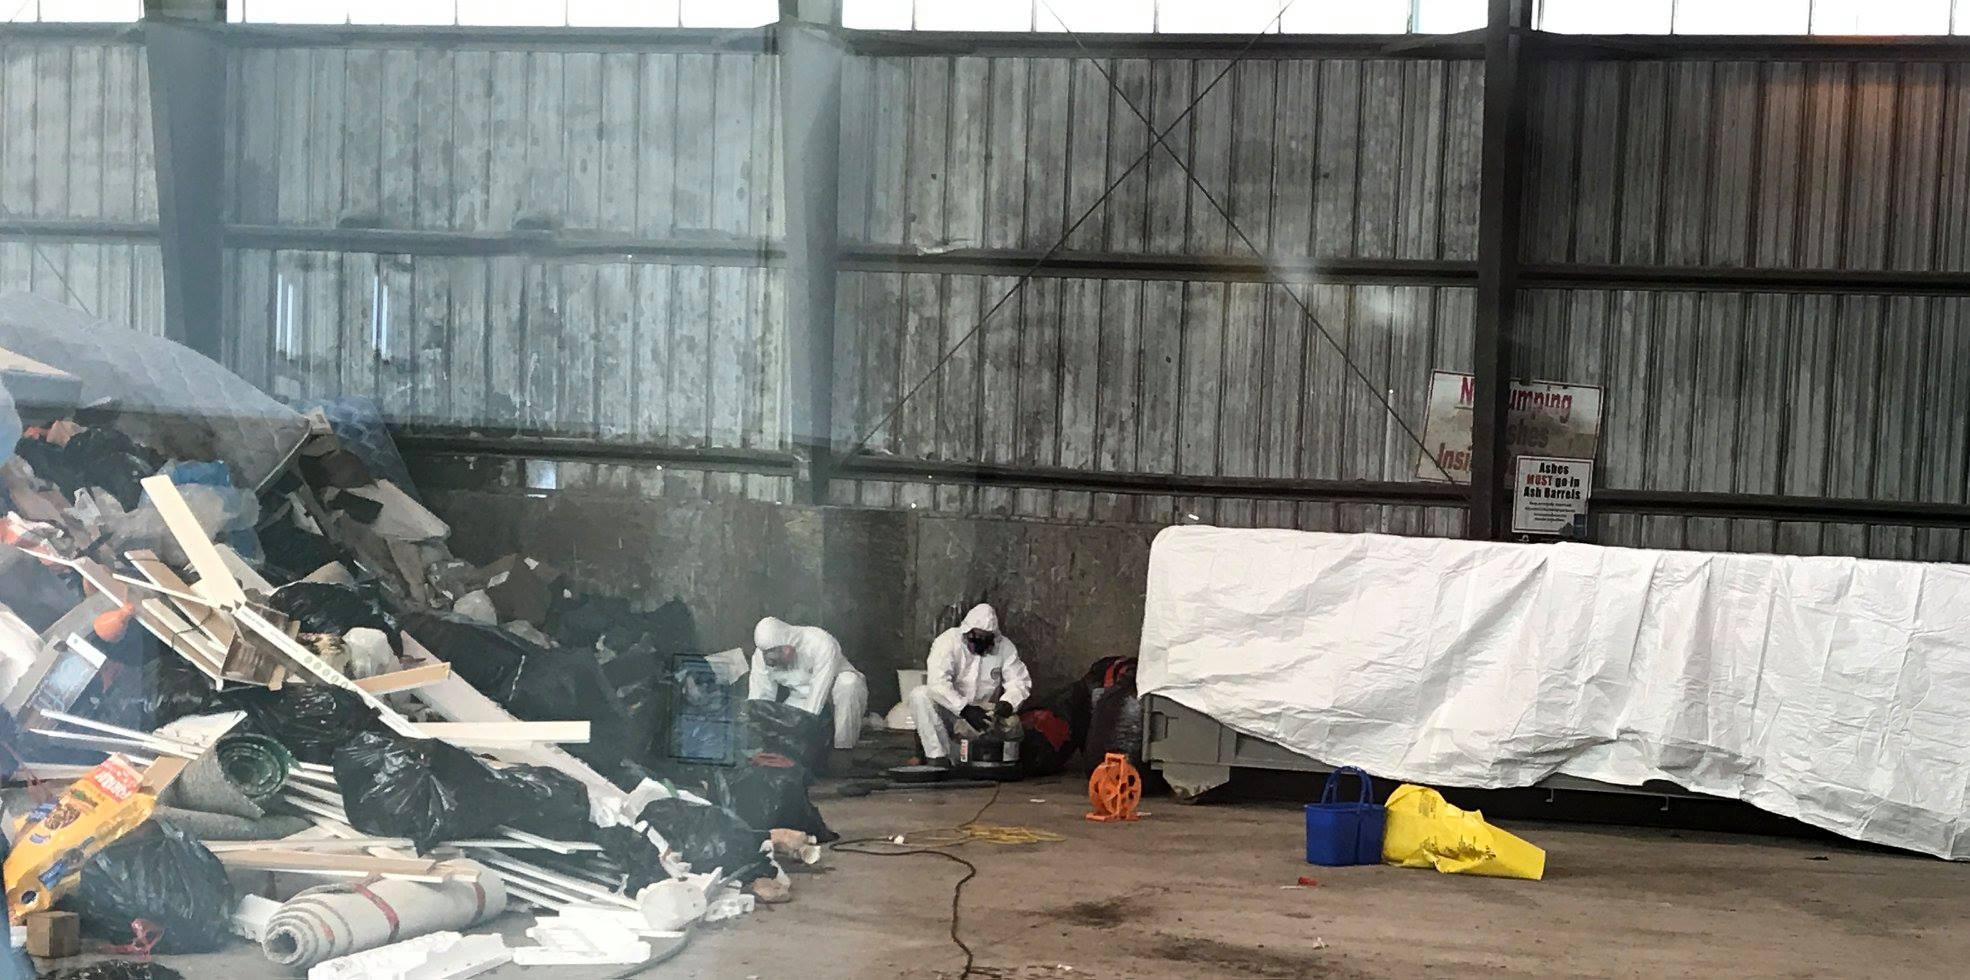 RDEK cleaning up asbestos left at Cranbrook transfer station